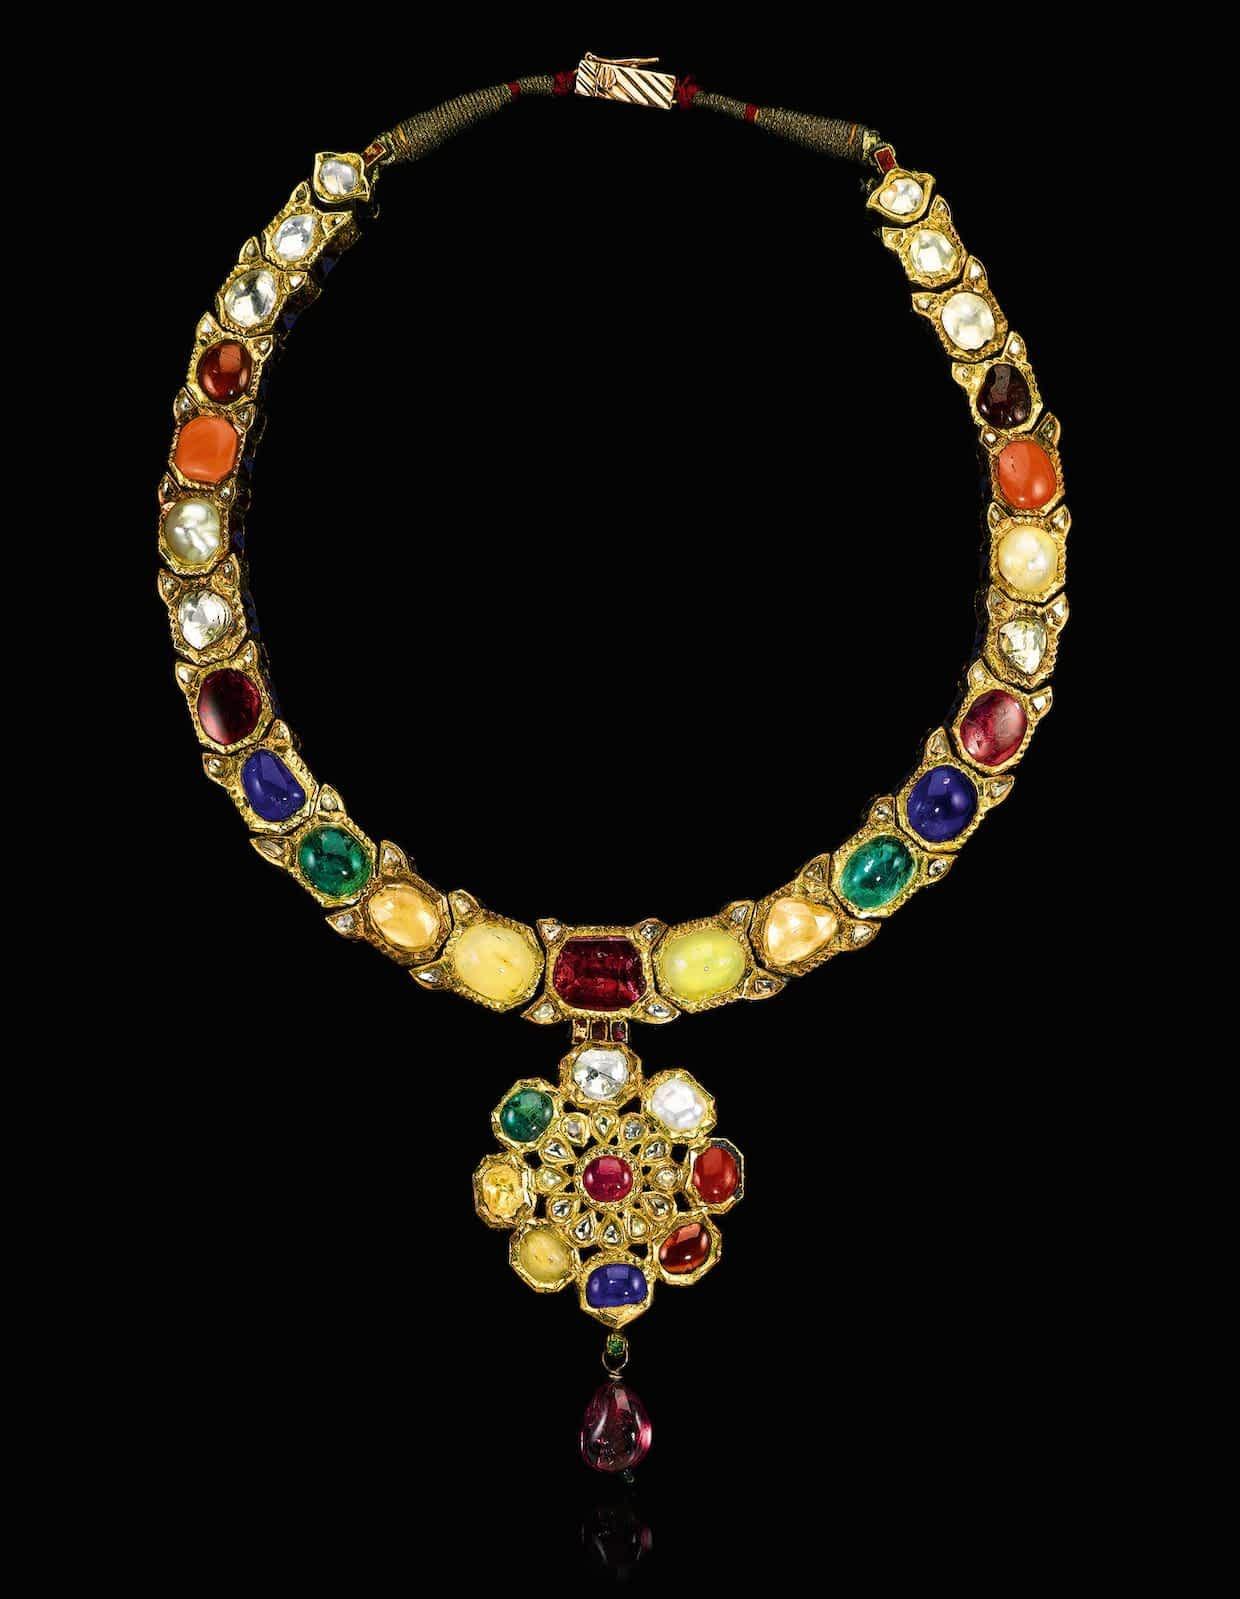 Indian court jewellery gems